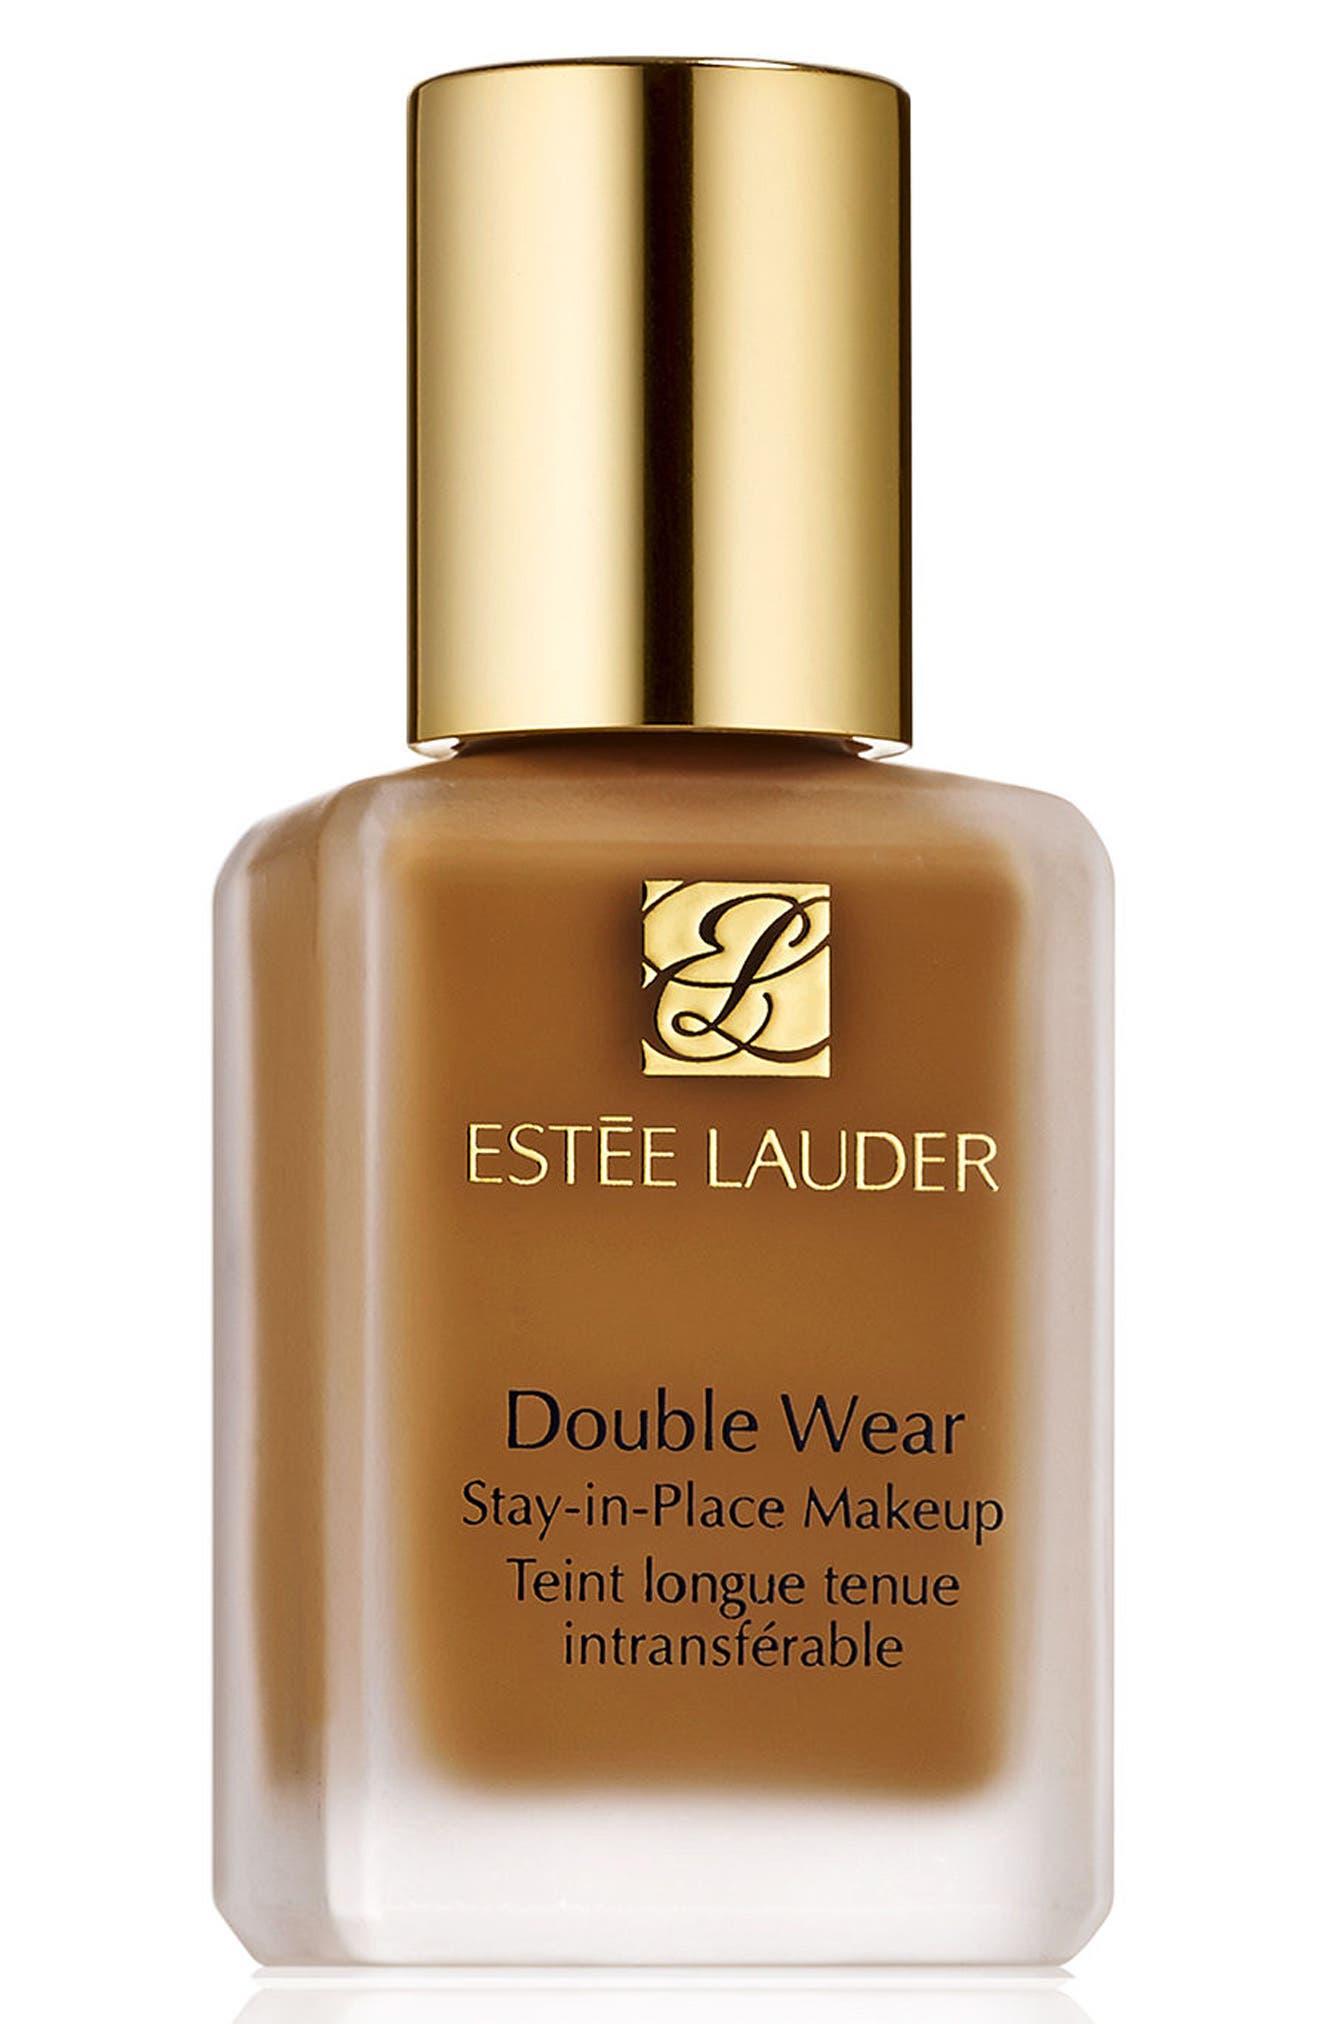 Estee Lauder Double Wear Stay-In-Place Liquid Makeup - 6C1 Rich Cocoa